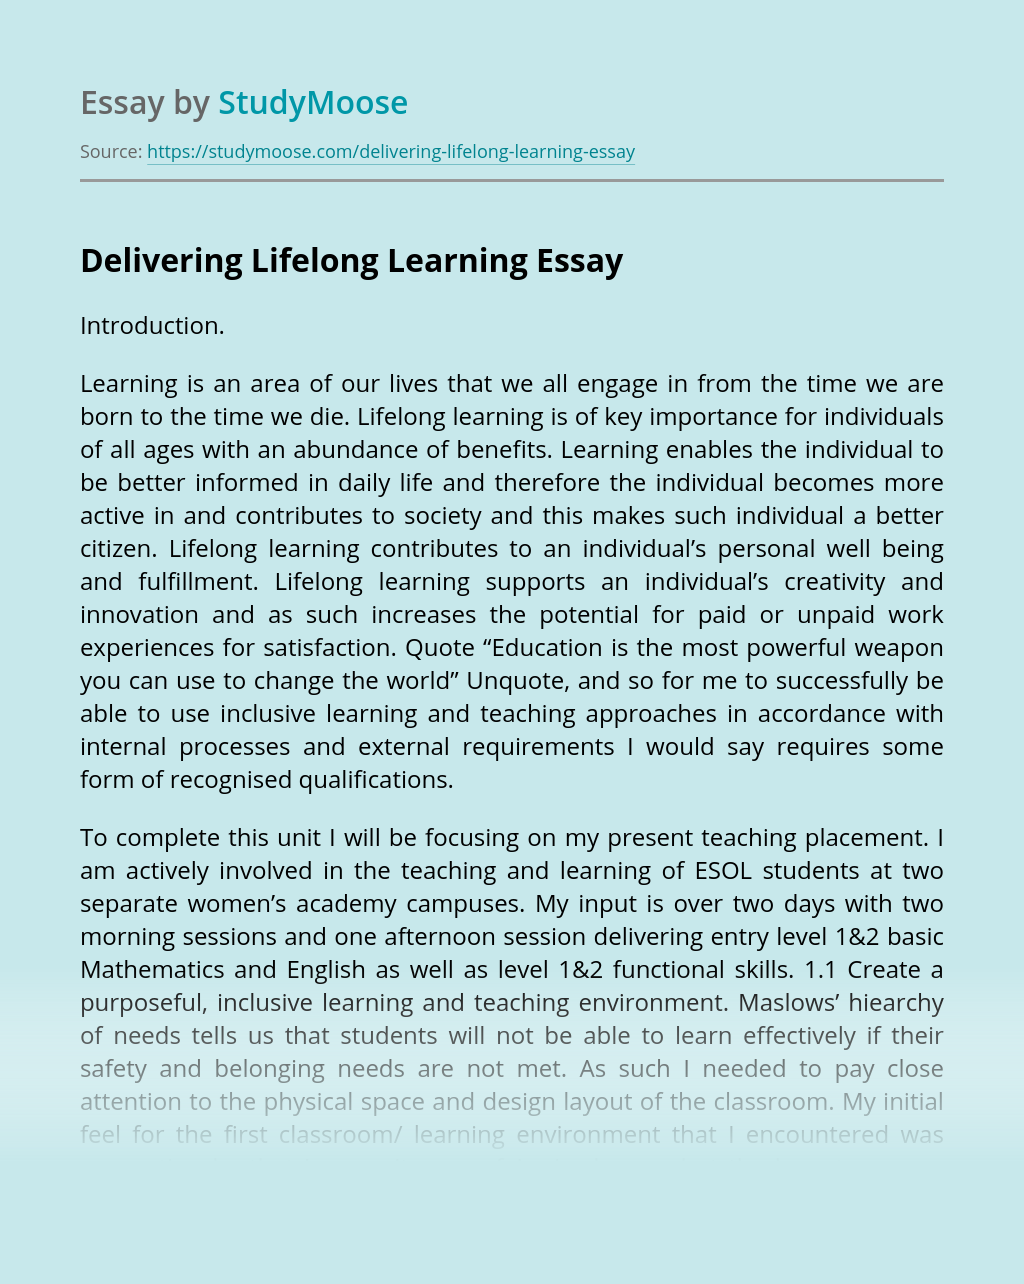 Delivering Lifelong Learning